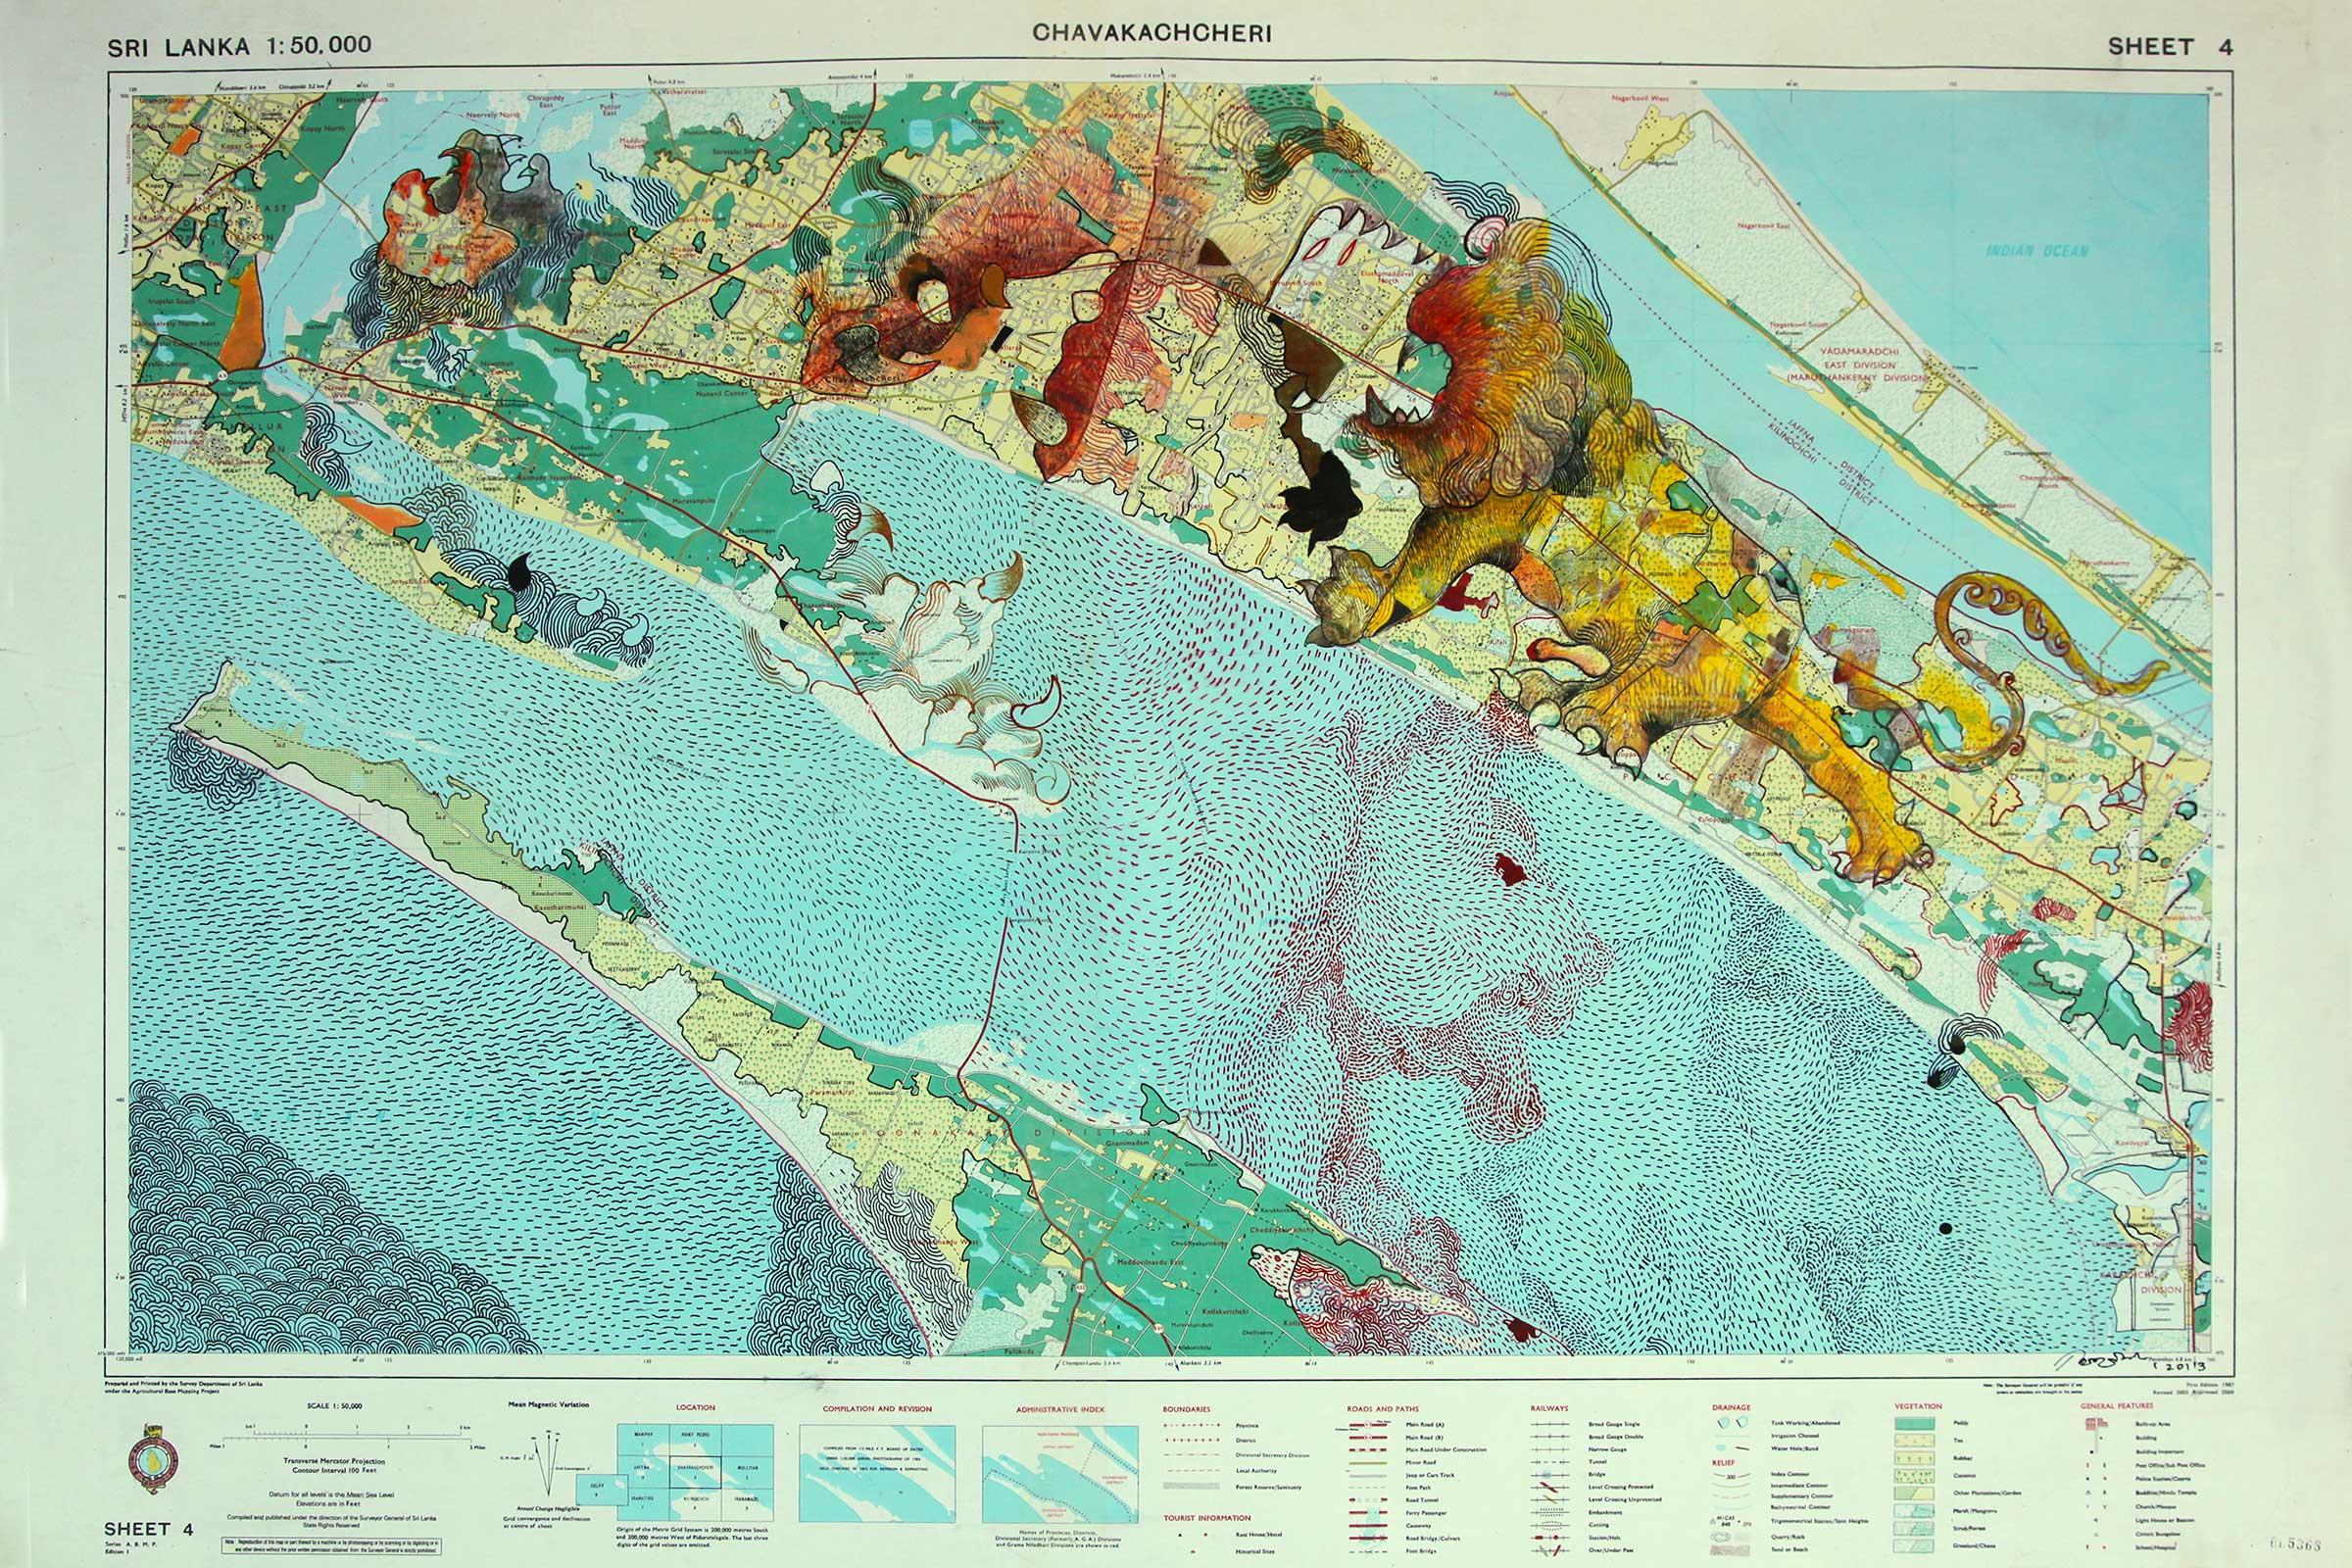 Pala Pothupitiye,  Chavakachcheri Map , 2015. Government printed map, ink, pencil, Japanese rice paper, 65 x 90cm